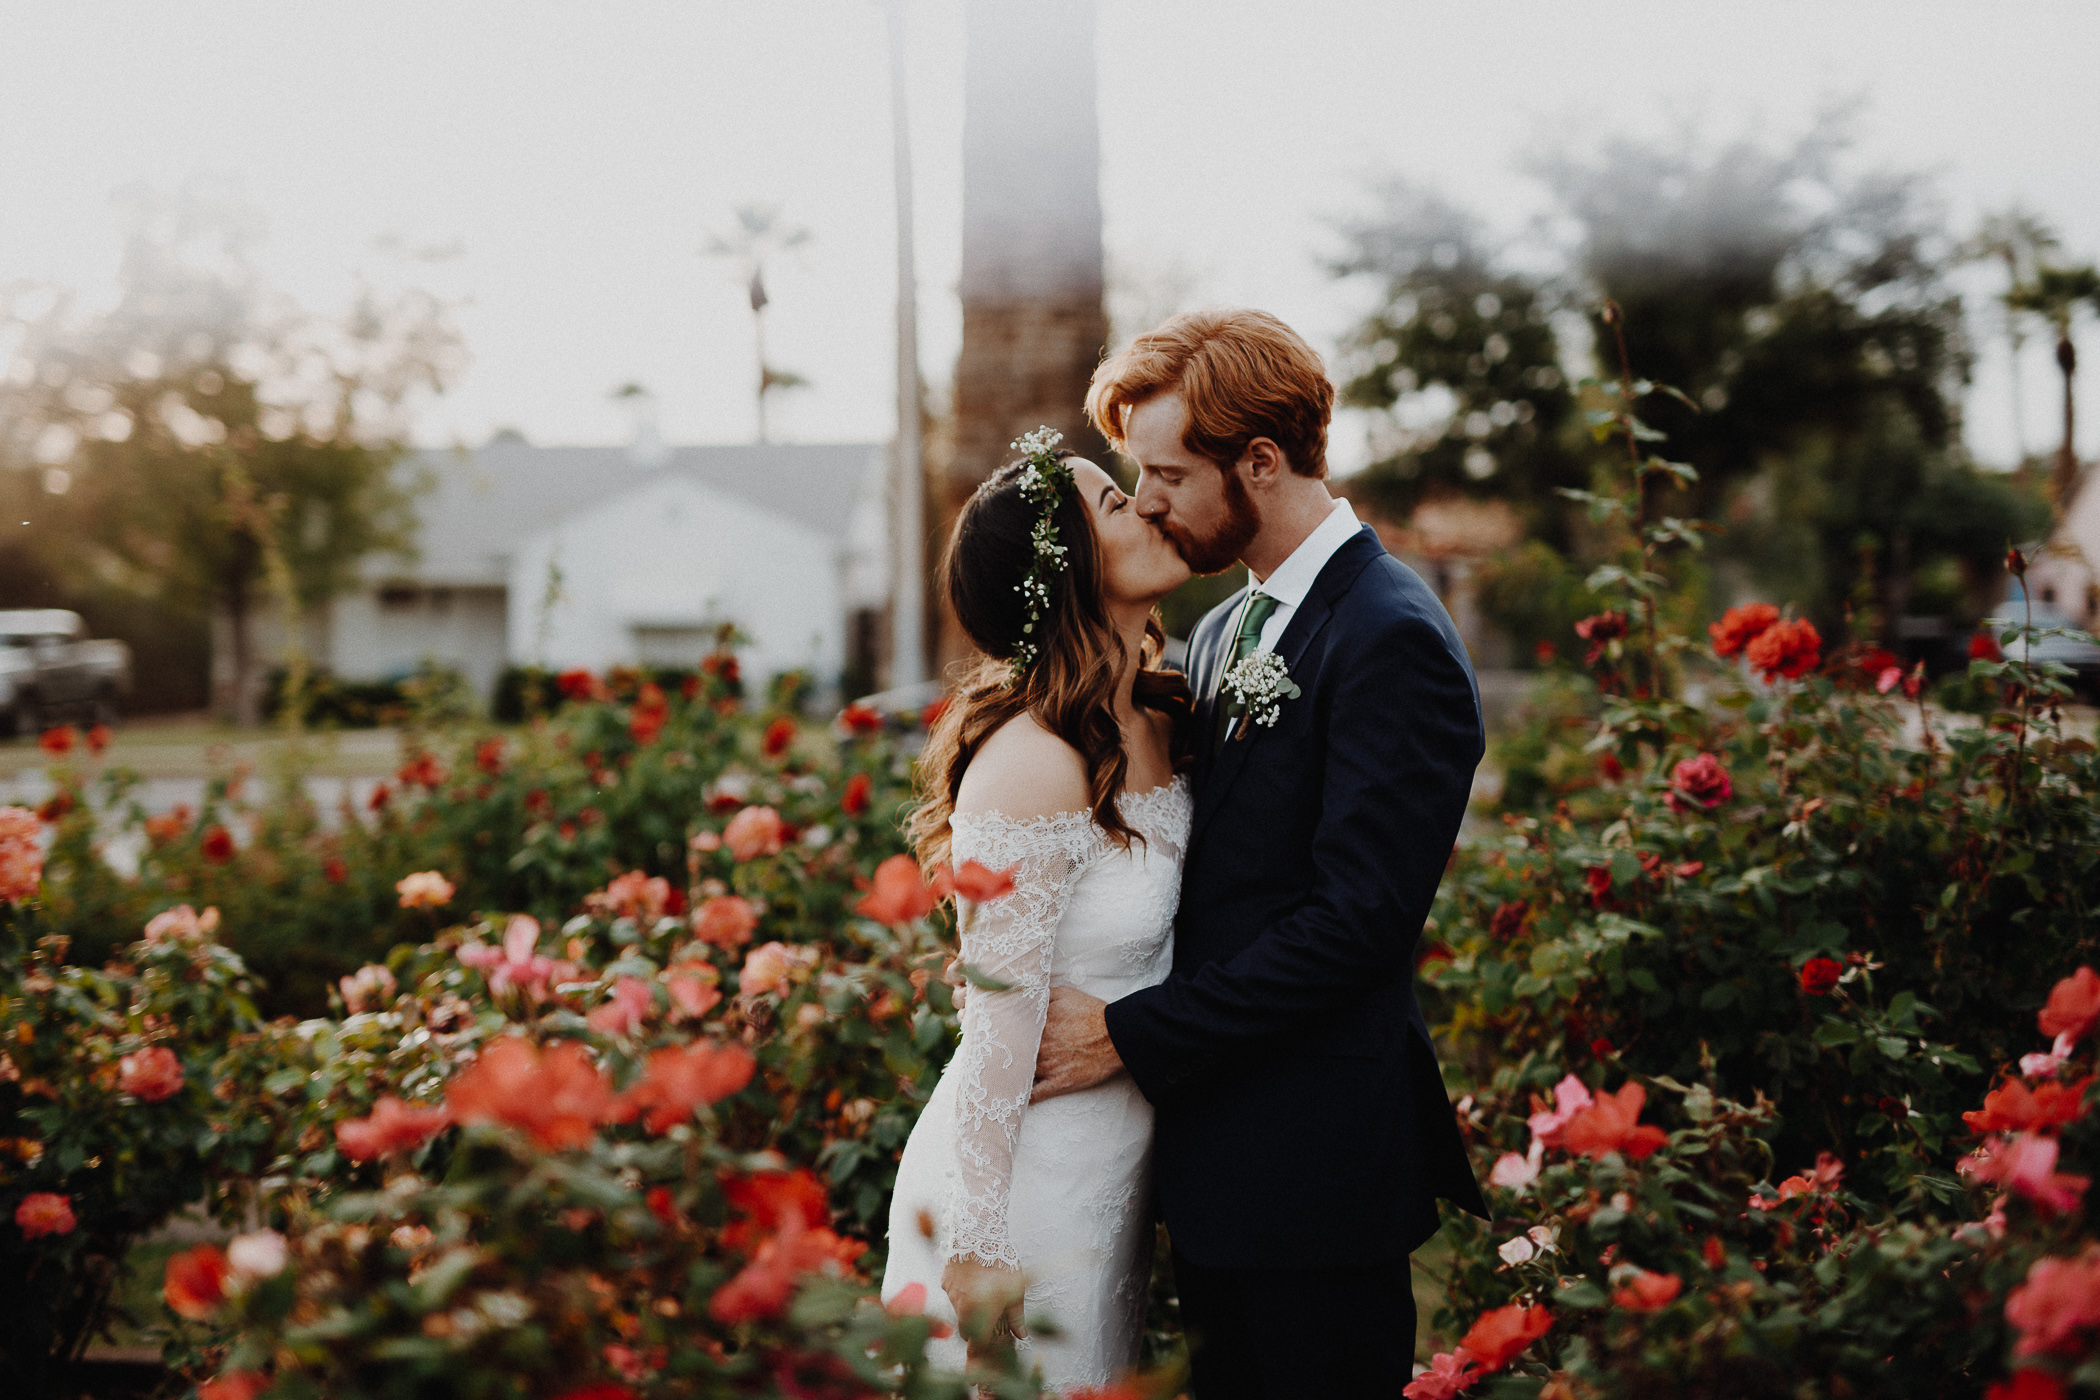 181104-Luxium-Weddings-Arizona-@matt__Le-Brandon-Kariana-Phoenix-Valley-Garden-Center-1117.jpg